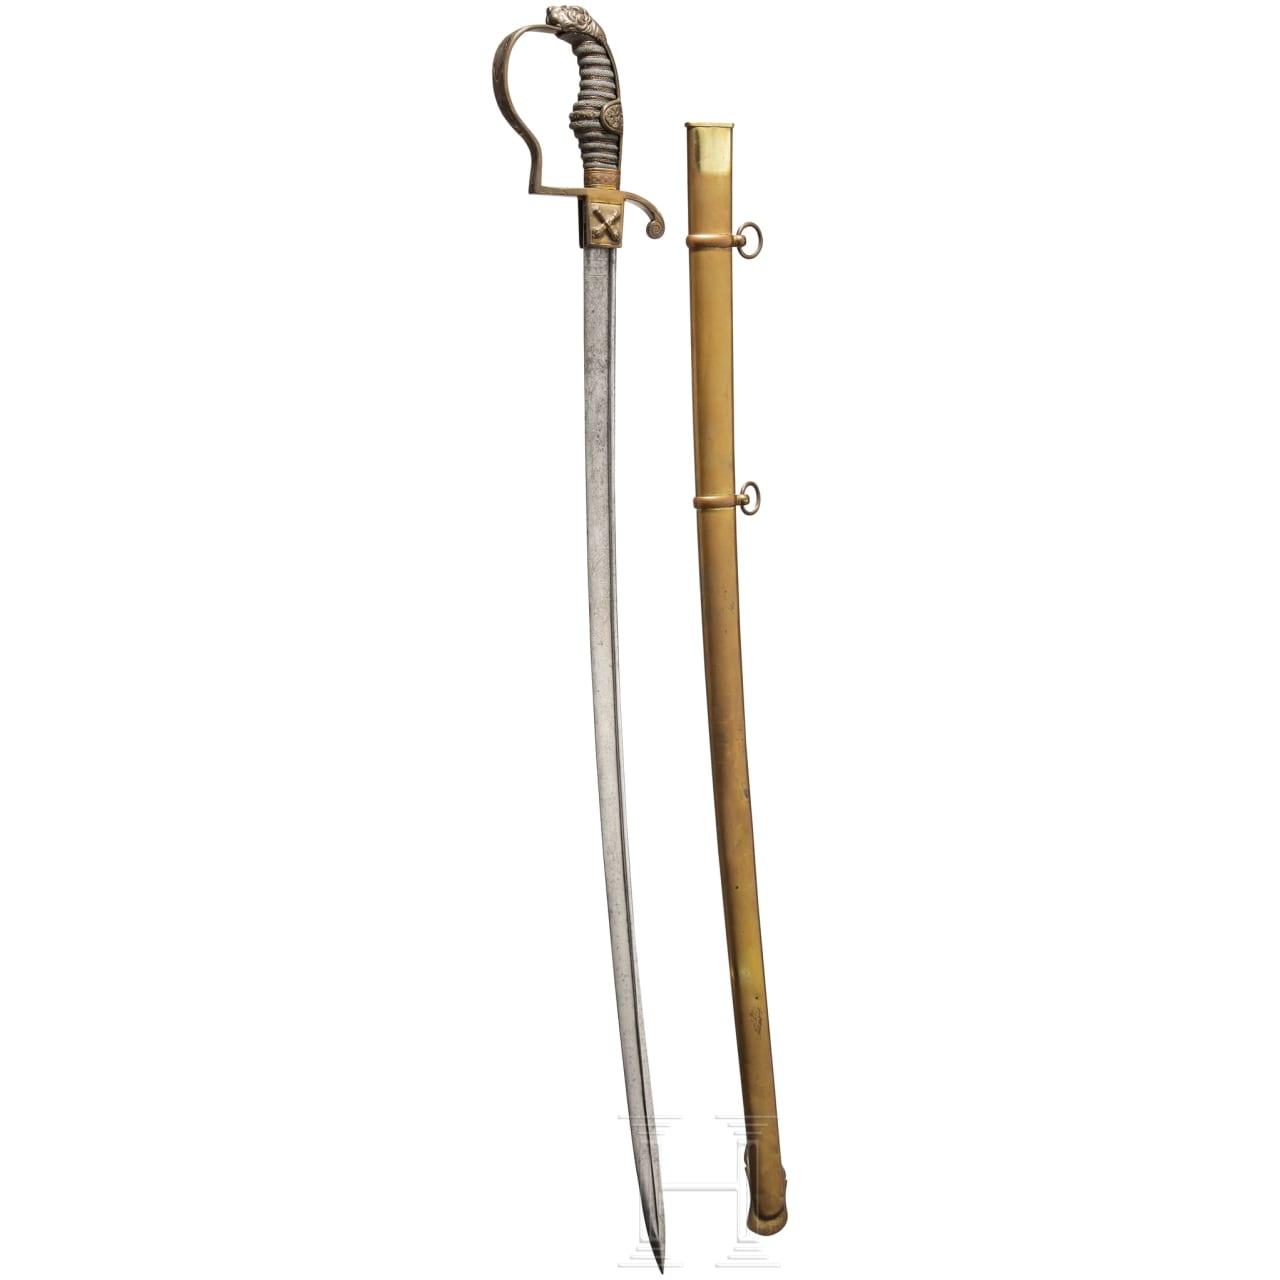 A sabre for officers of the Hamburg militia, circa 1840